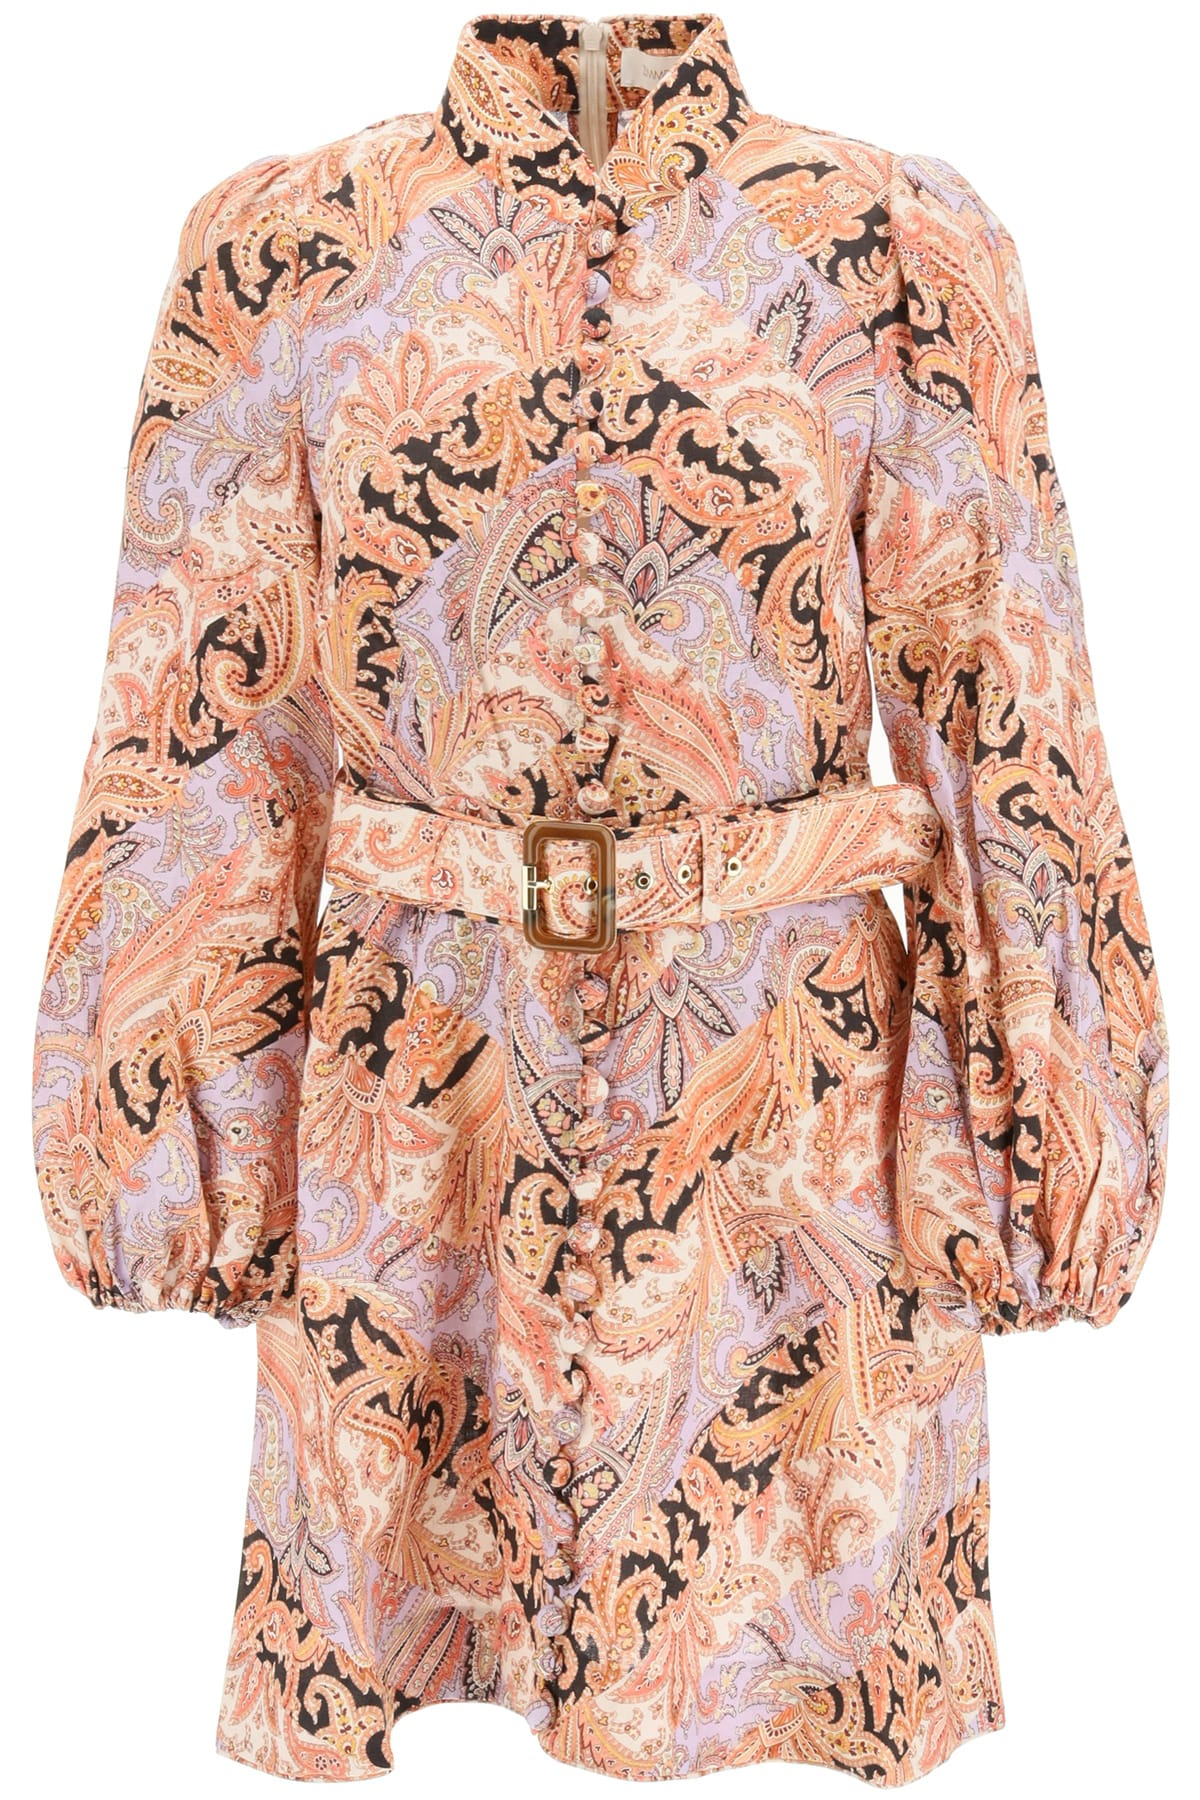 Buy Zimmermann Botanica Chevron Paisley Mini Dress online, shop Zimmermann with free shipping